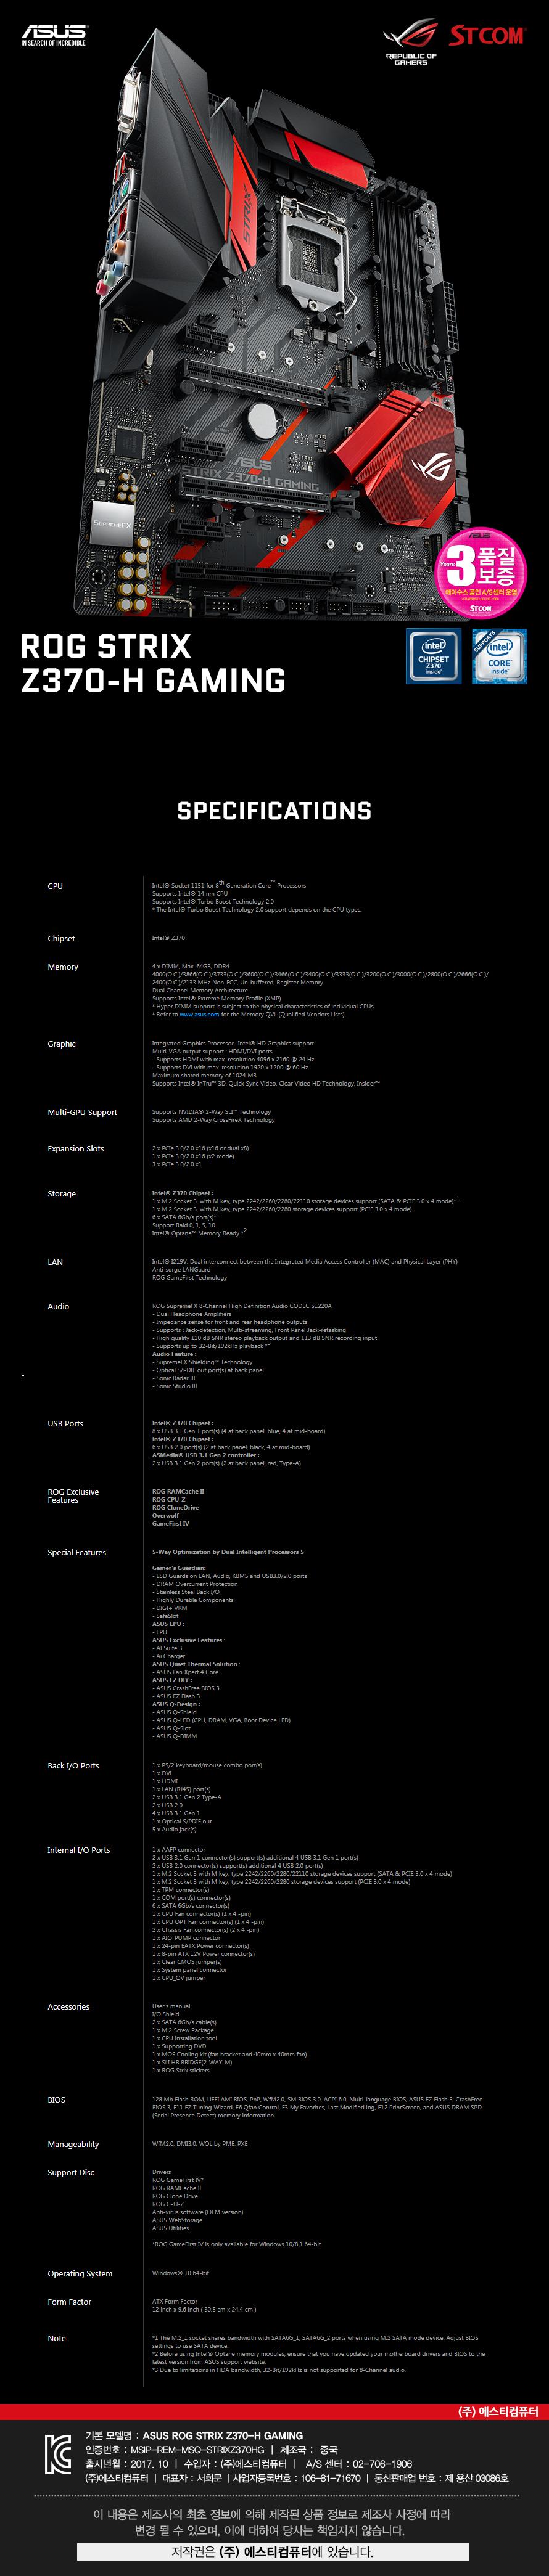 ASUS ROG STRIX Z370-H GAMINGSTCOM.jpg